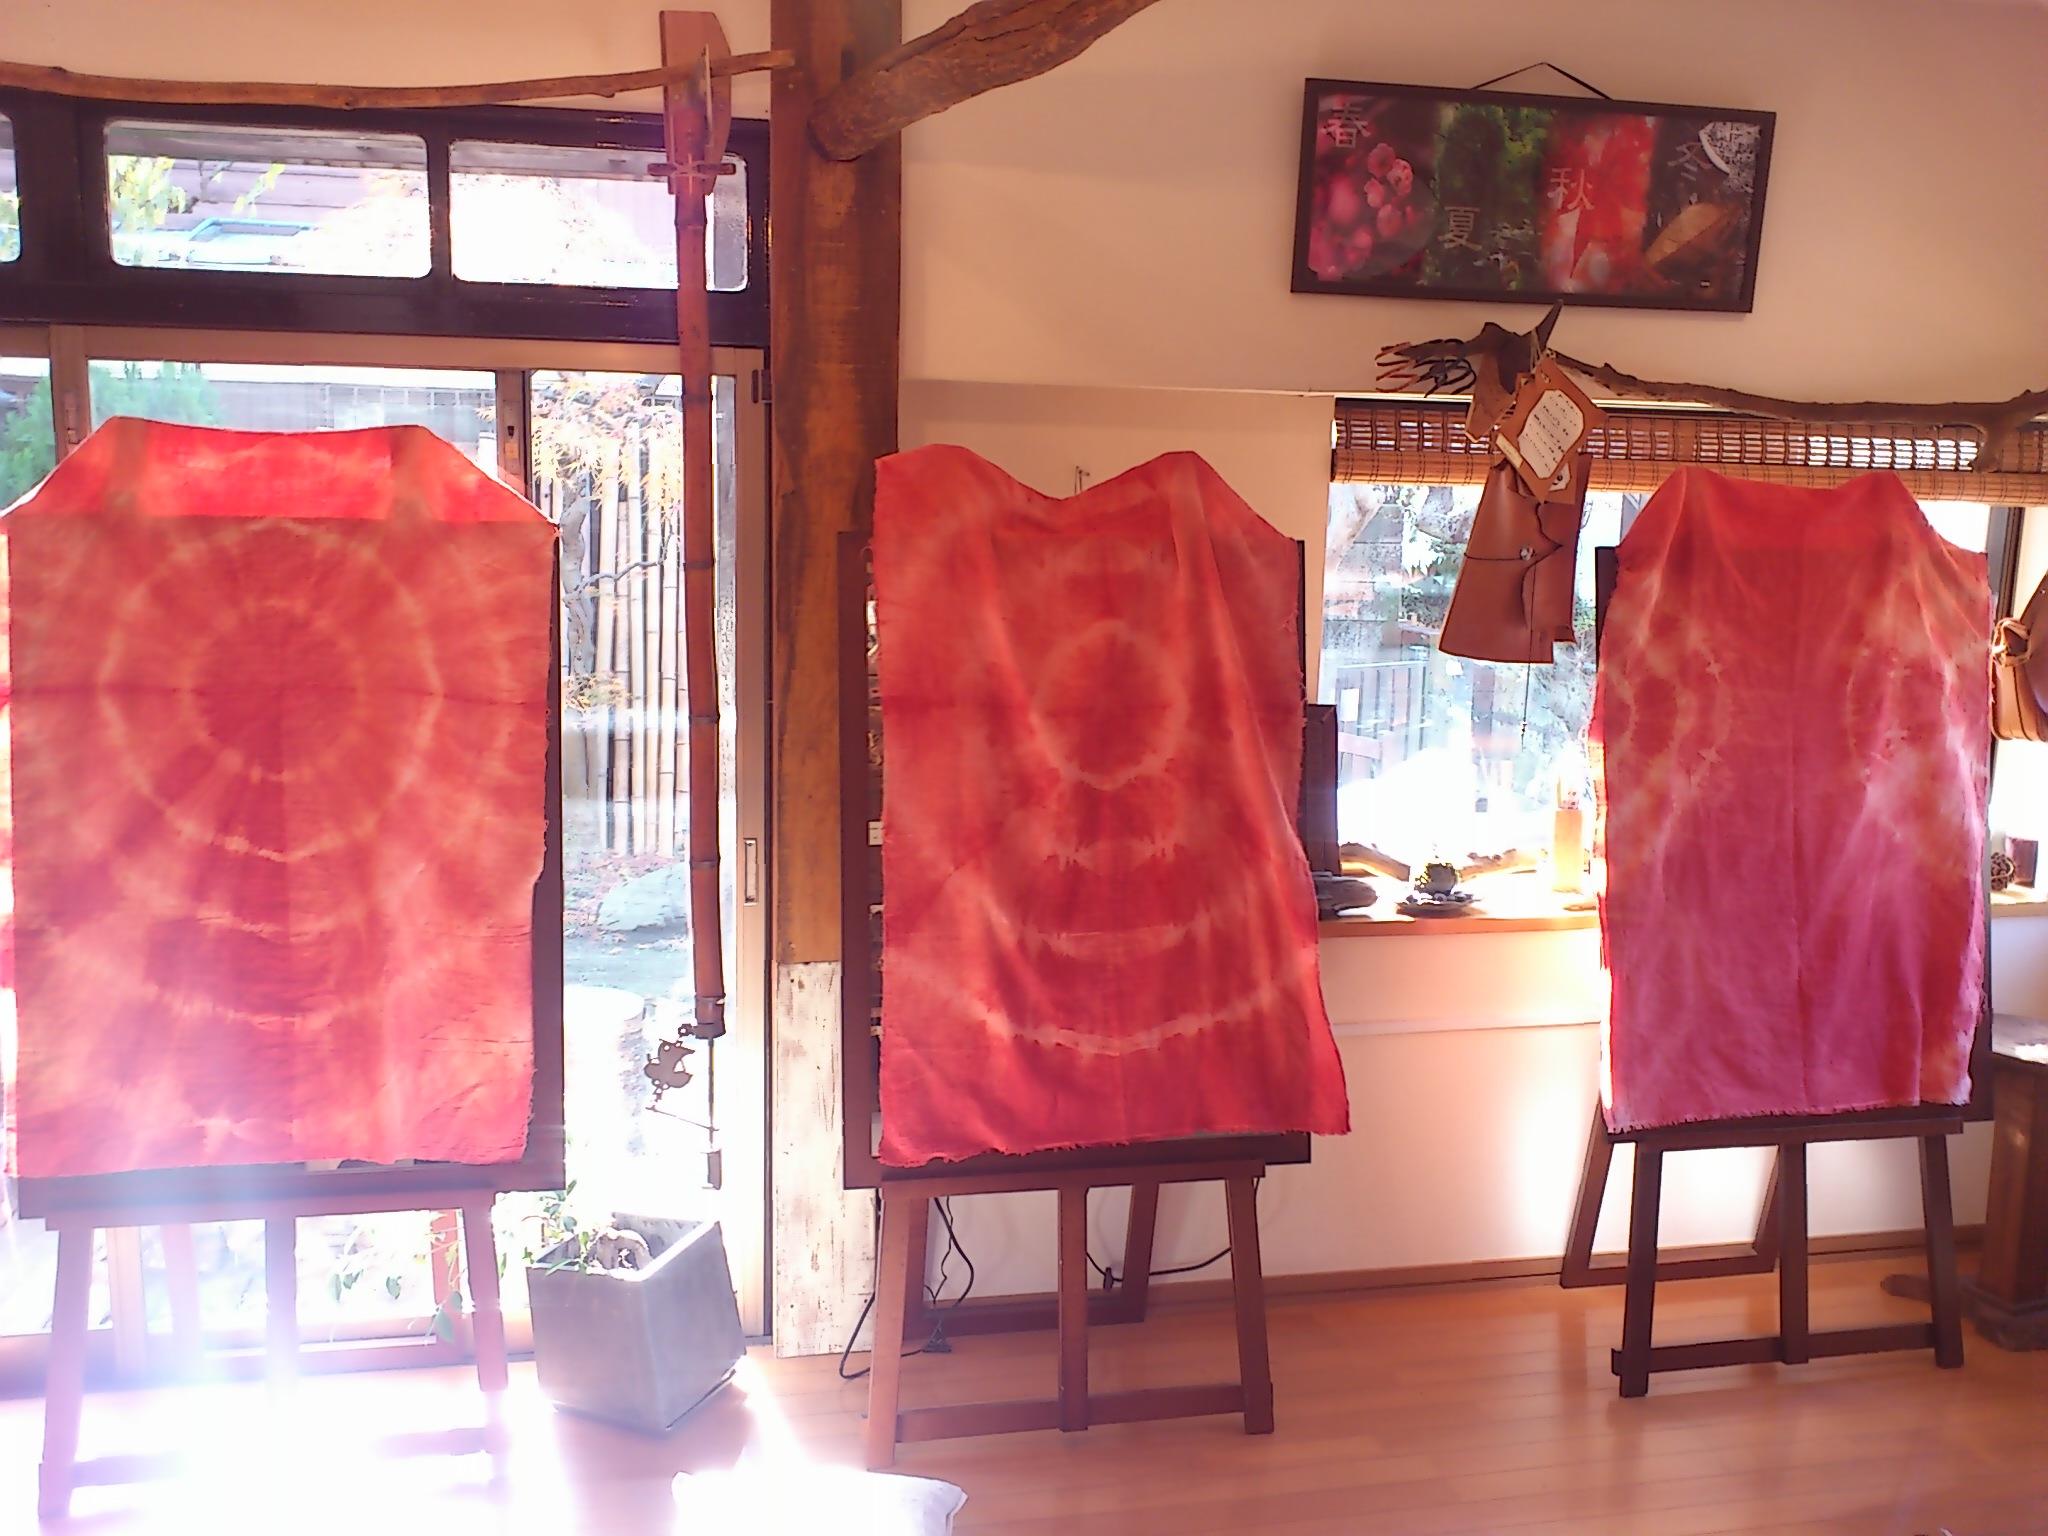 @SlowHairSalonGAKU。今から季節と養生ワークショップ。鏡台に茜染めの布を使ってもらっています。